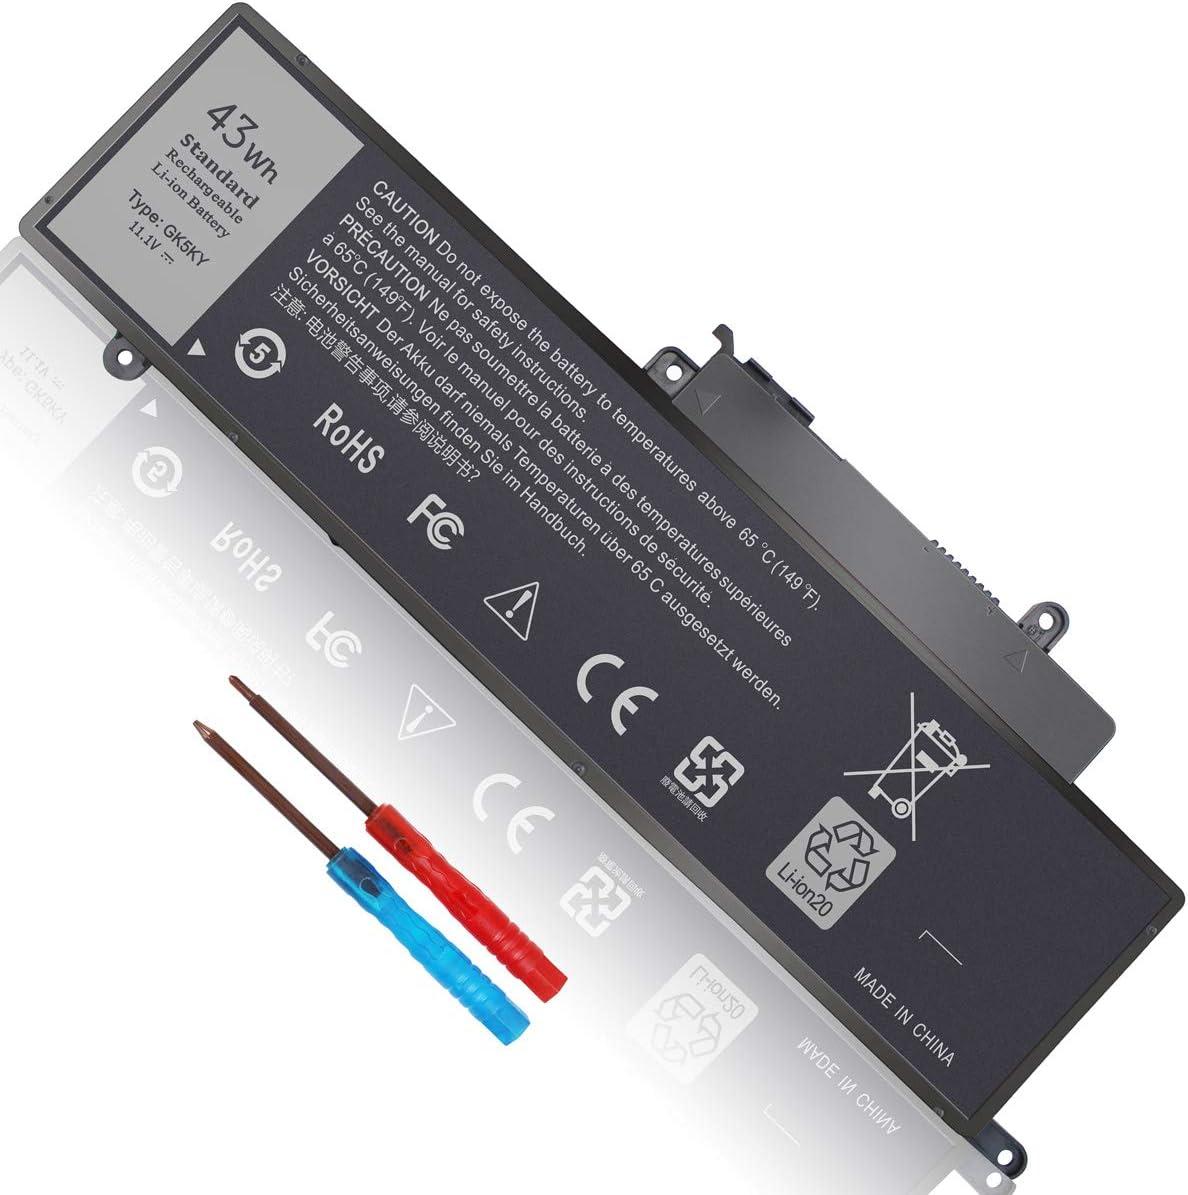 43Wh GK5KY Battery for Dell Inspiron 11 3000 Series 3147 3148 3152 3153 3157 13 7347 7348 7352 7353 7359 15 7558 7568 P20T P57G P55F 11-3147 11-3148 11-3152 11-3153 11-3157 2-in-1 92NCT 4K8YH 451-BBKK